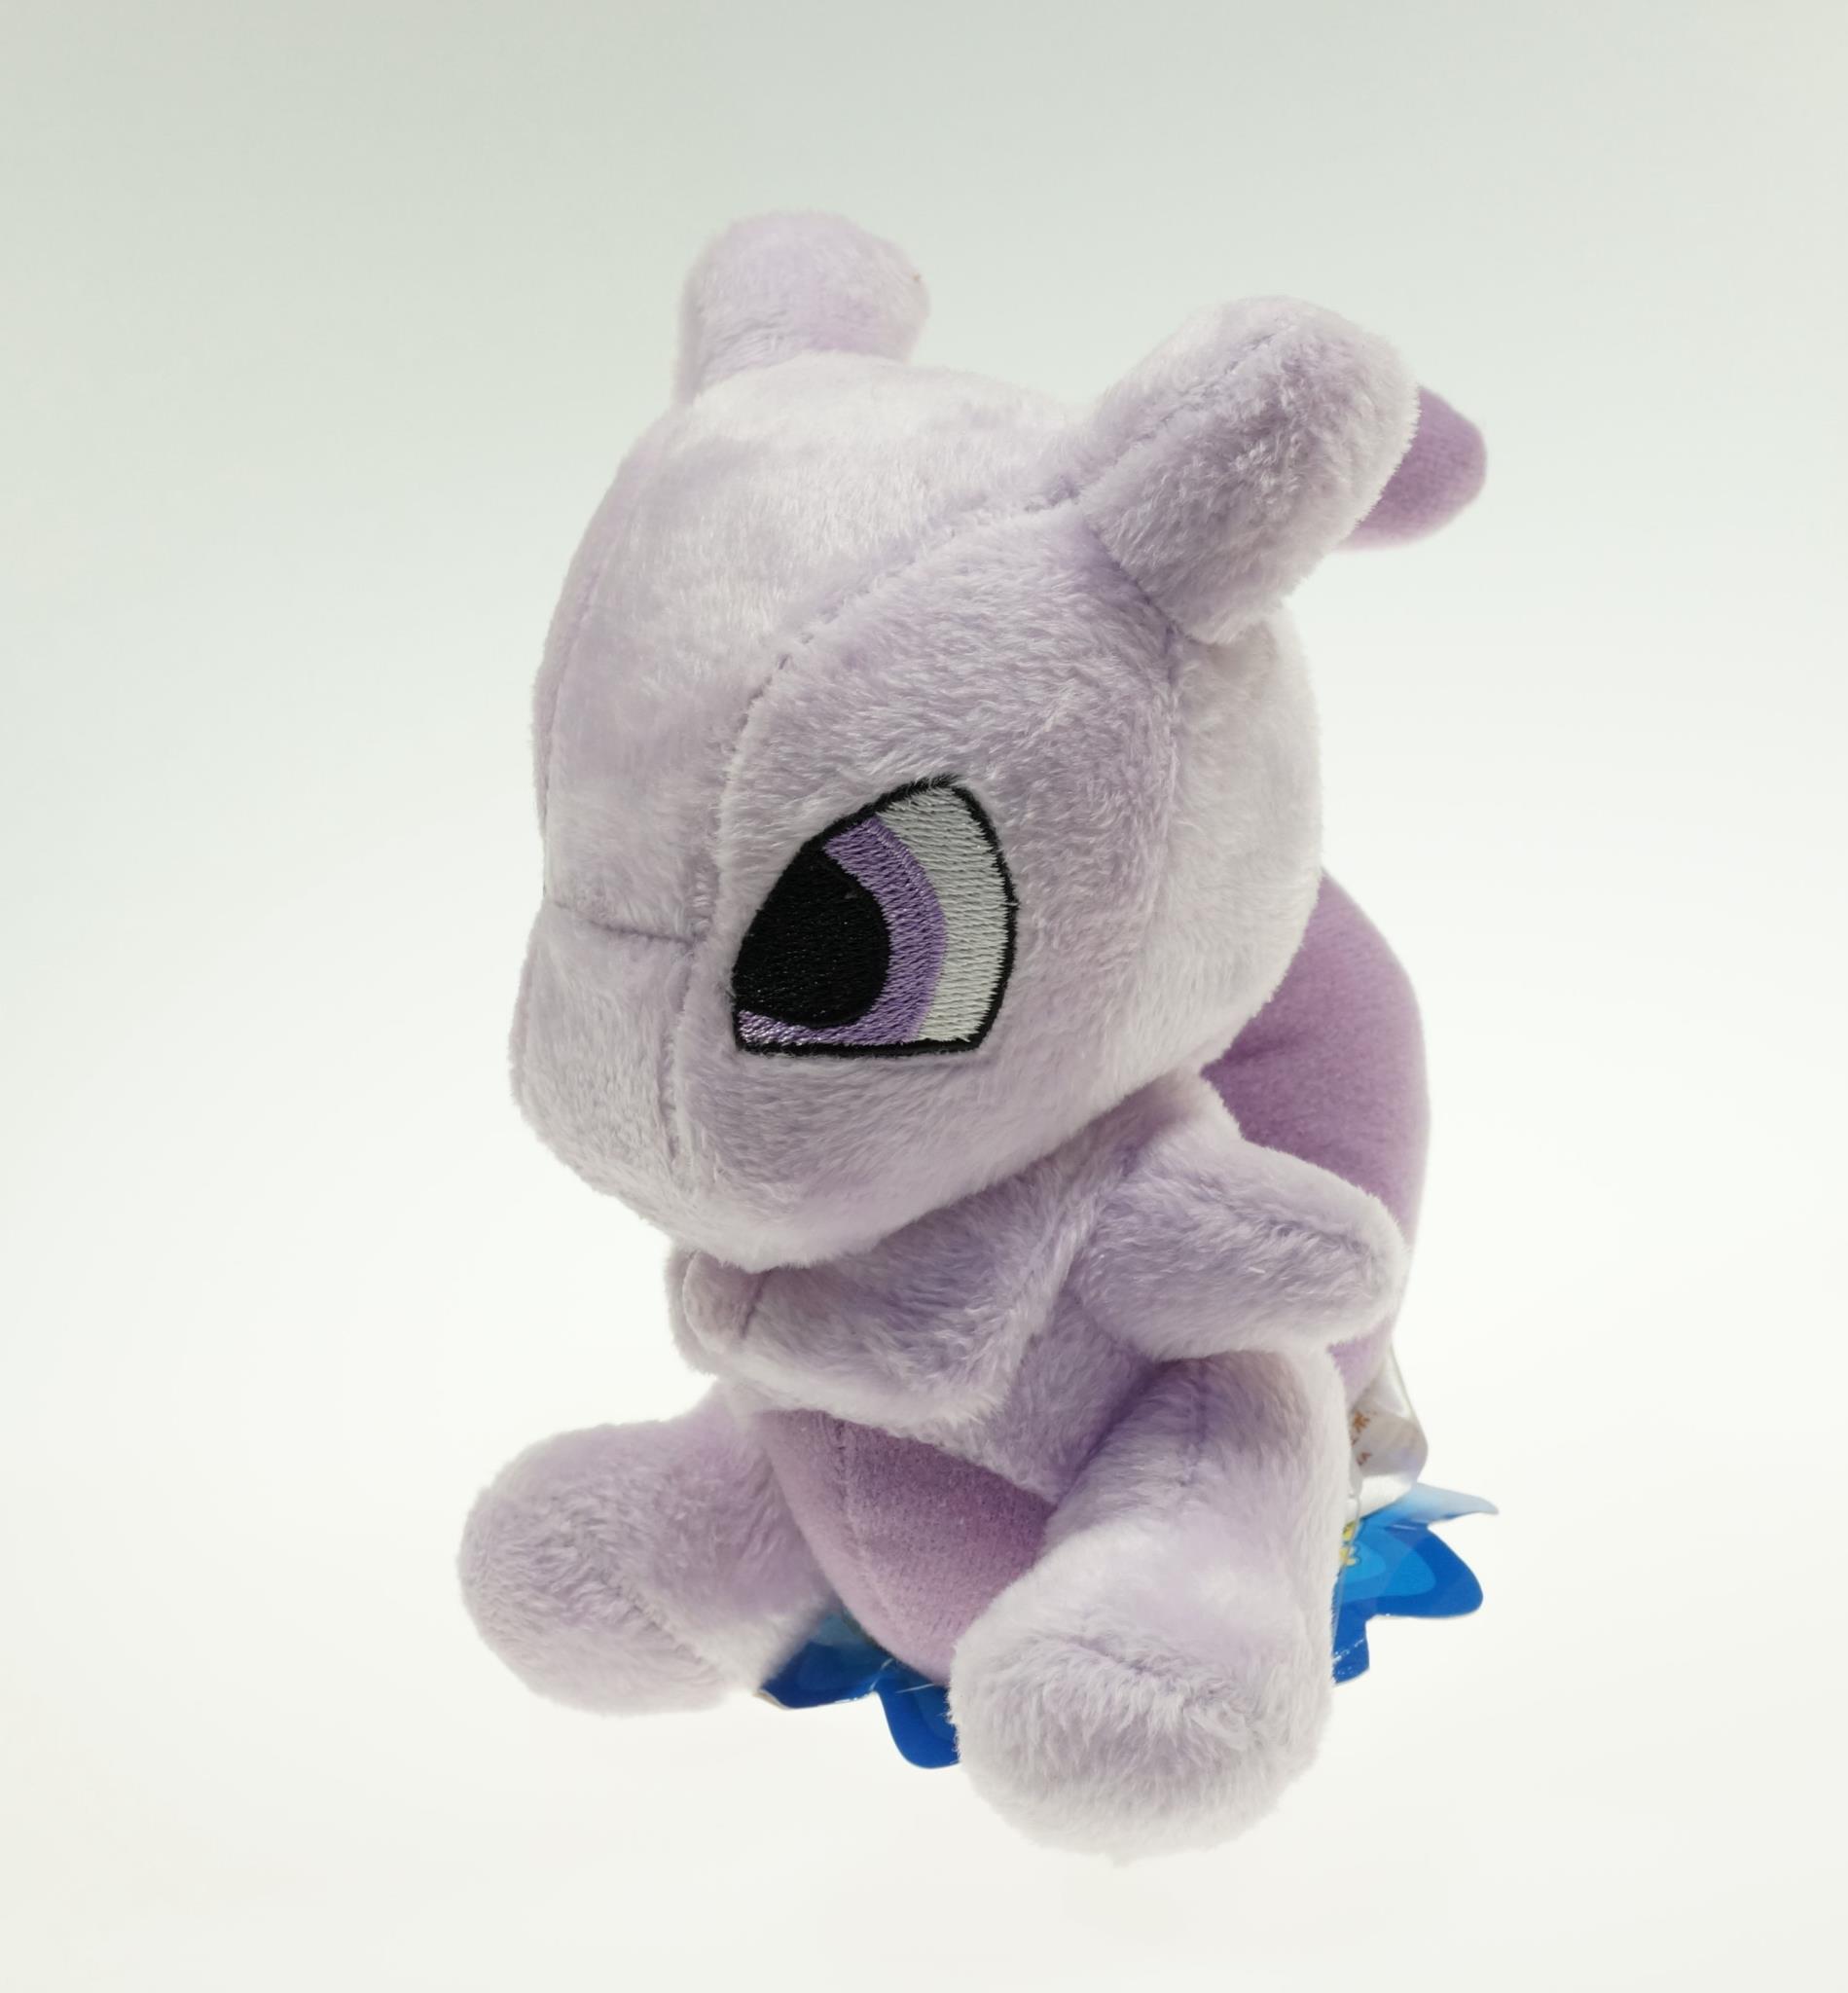 "6"" 17cm Pokemon Cute Mewtwo Plush Toys For Children Retail Mewtwo Plush Doll Stuffed Mewtwo Best Birthday Gift For Child(China (Mainland))"